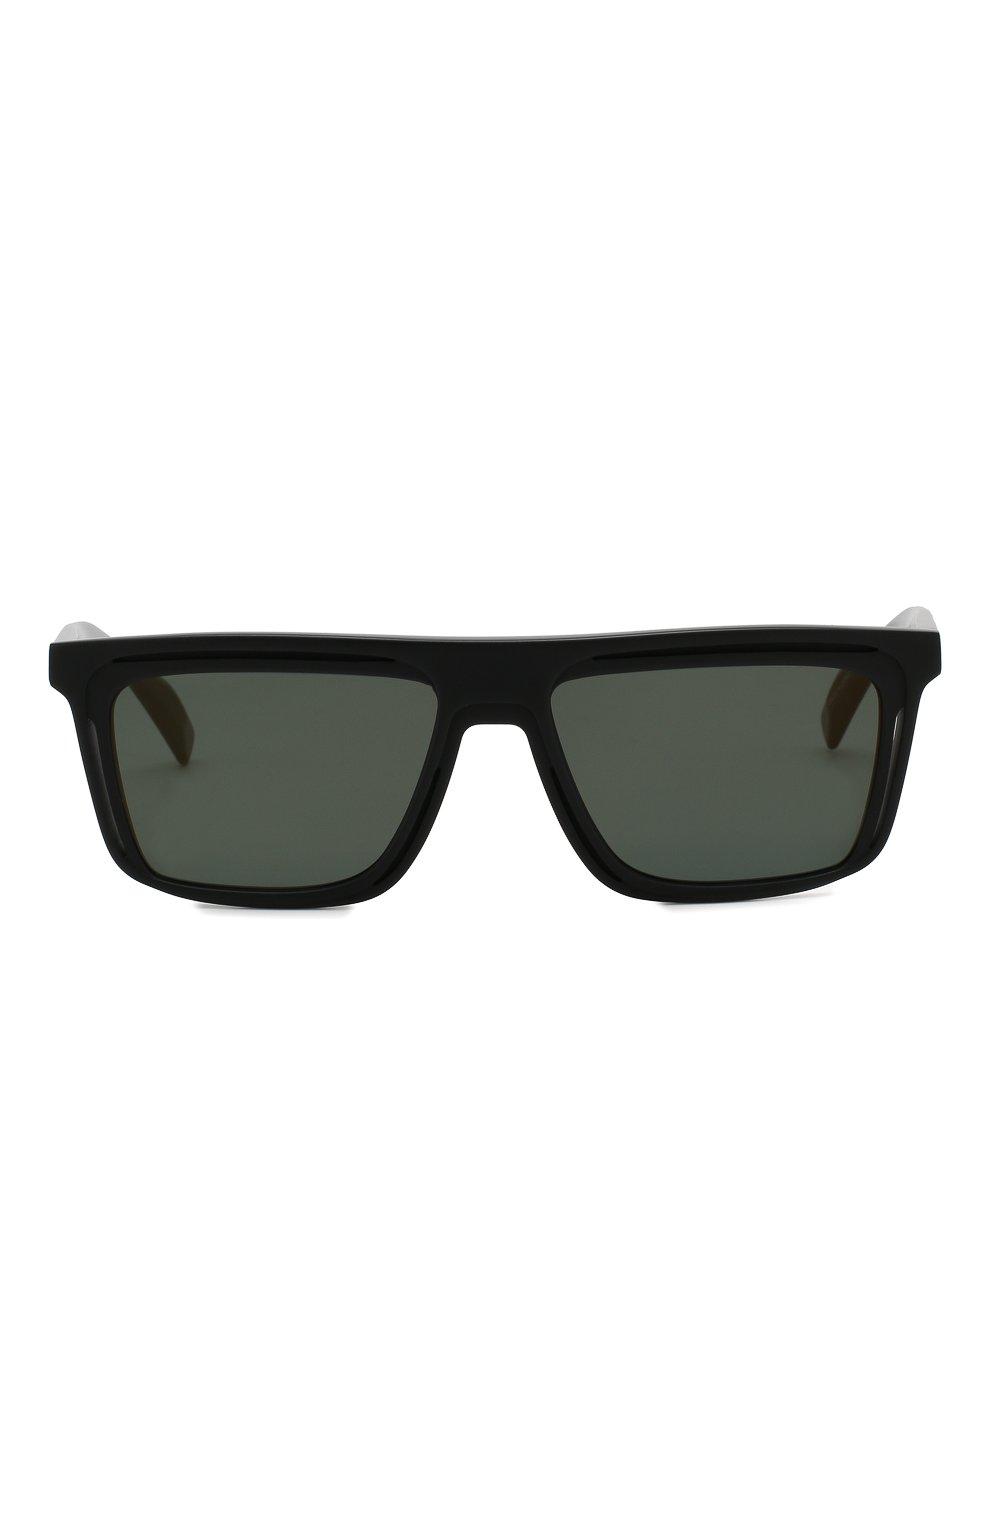 Мужские солнцезащитные очки YOHJI YAMAMOTO черного цвета, арт. YY5020 002 | Фото 2